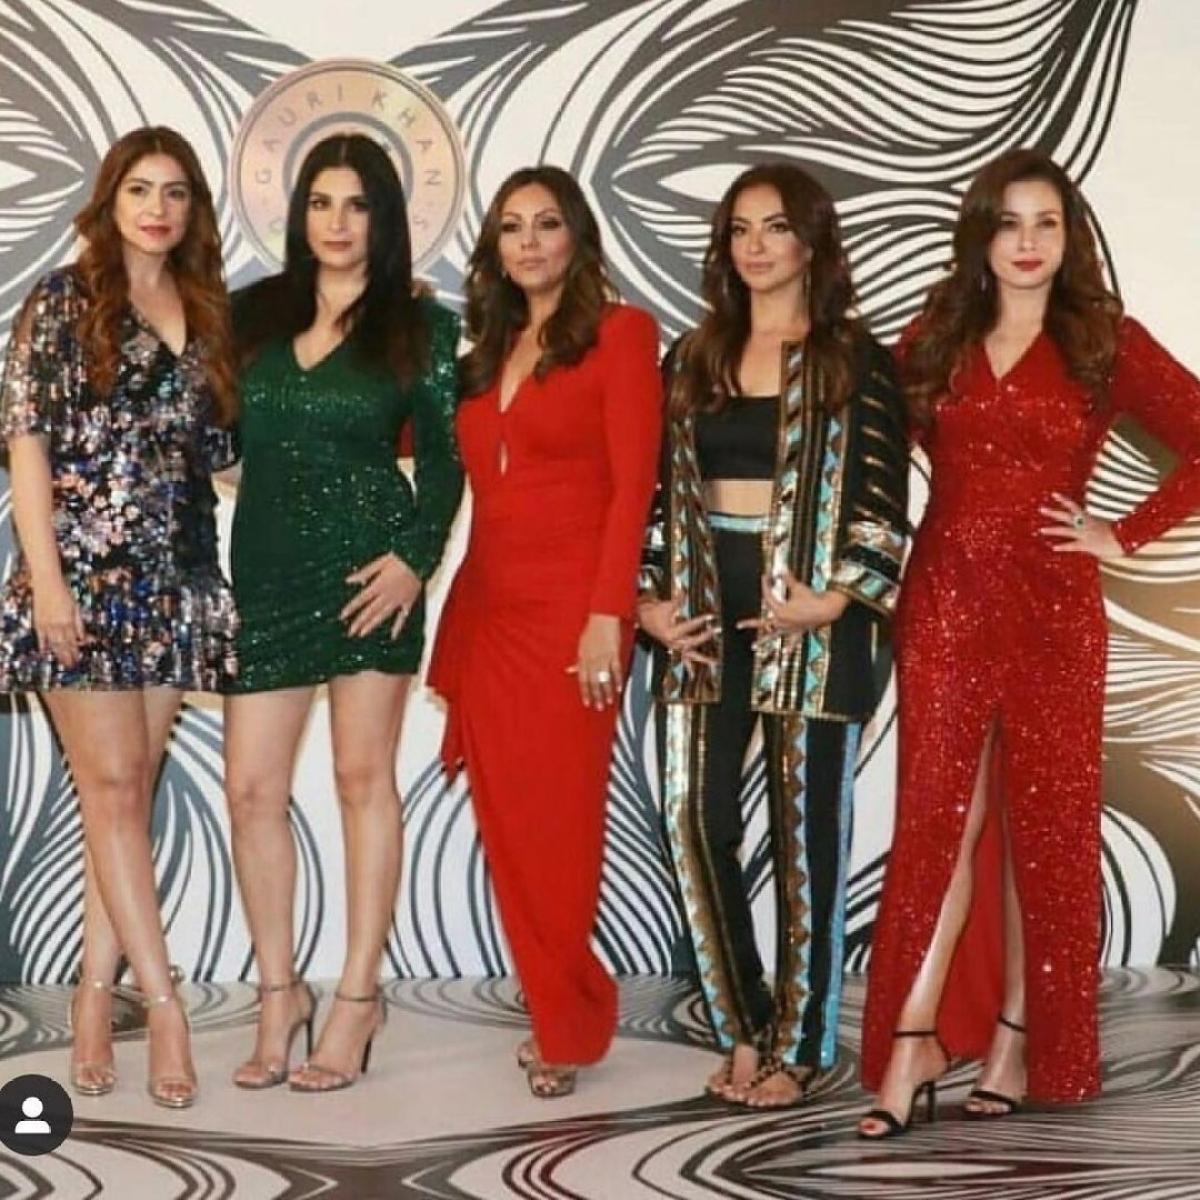 Netflix rolls out trailer of 'Fabulous Lives of Bollywood Wives' ft. Seema Khan, Maheep Kapoor, Bhavana Pandey, and Neelam Kothari